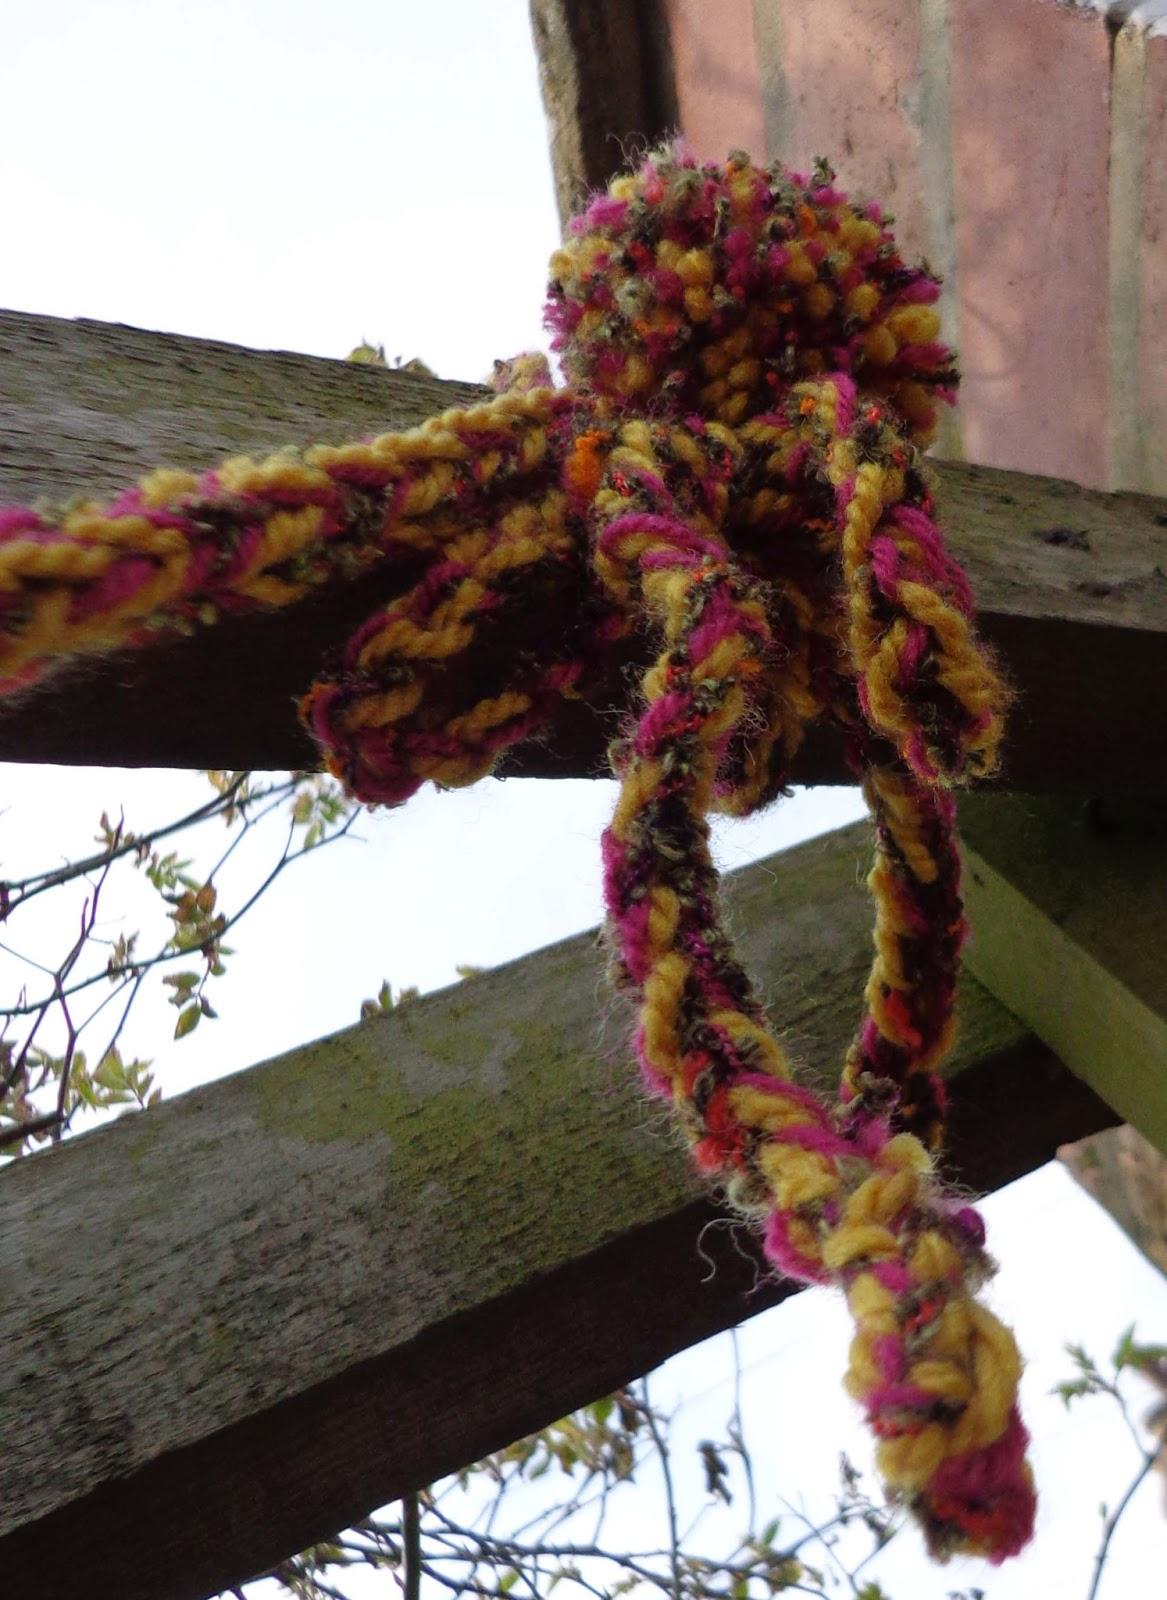 Finger Knitting Flowers : Hippystitch yarnbombing in rowntree park york